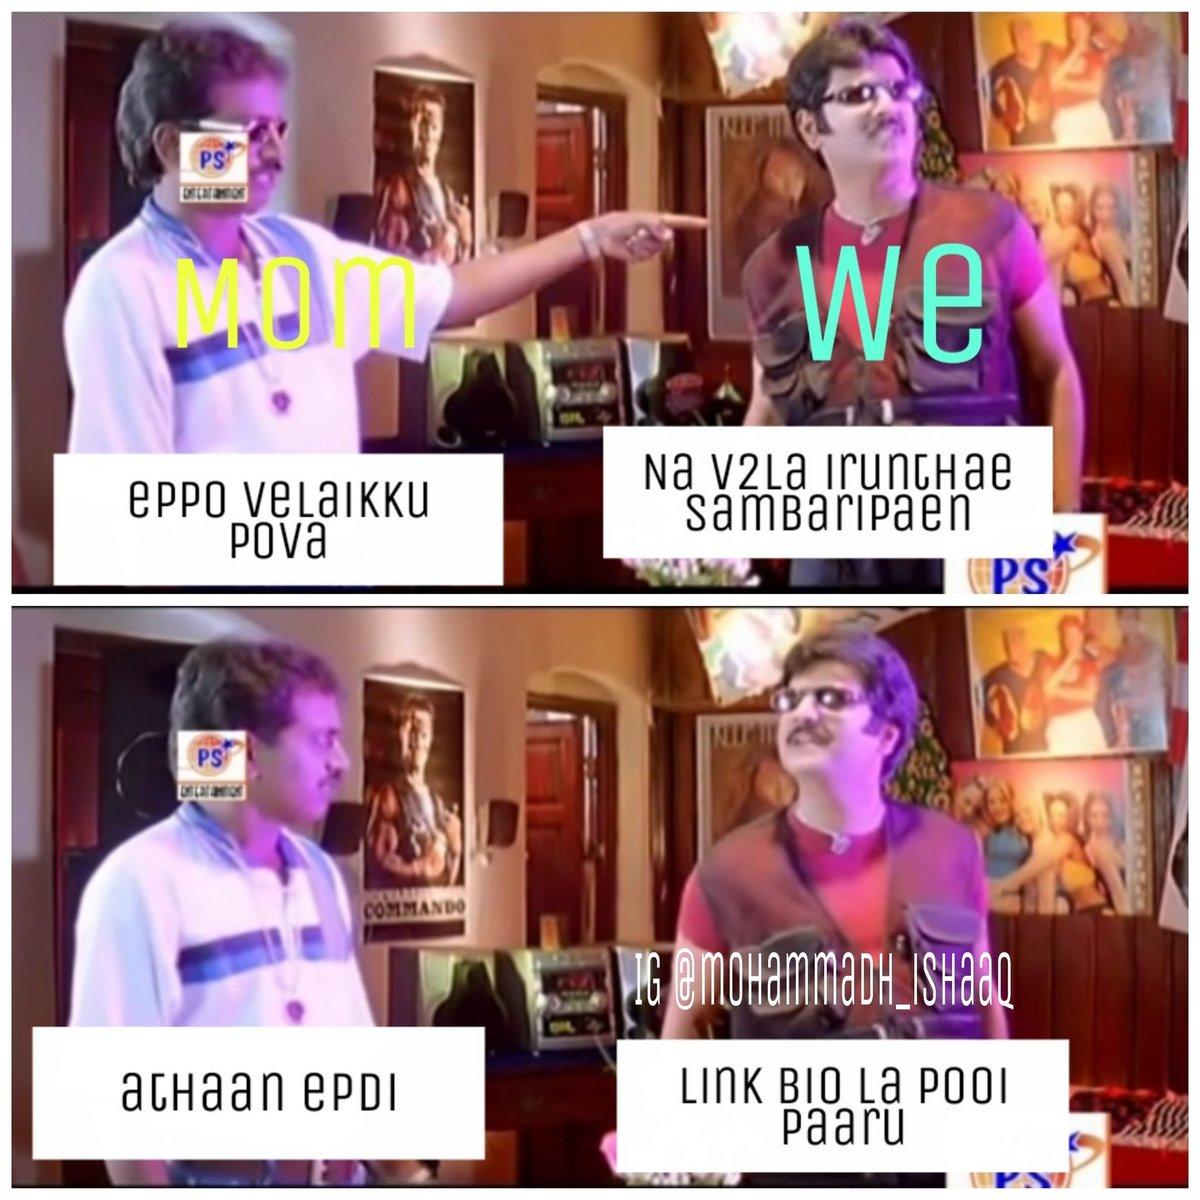 #attumemes #nayanthara #mokkapostu #thalapathyvijay #tamillovesong #memes #tamildubs #rajinikanth #tamilnadu #90skids #tamillyrics #dhanush #tamilan #kollywood #kollywoodactress #tamiltiktok #tamiltrolls #tamilmovies #tamilcomedy #vijaytv #tamilcinema http://bit.ly/2UEIwx7pic.twitter.com/p9bDtNvGDq